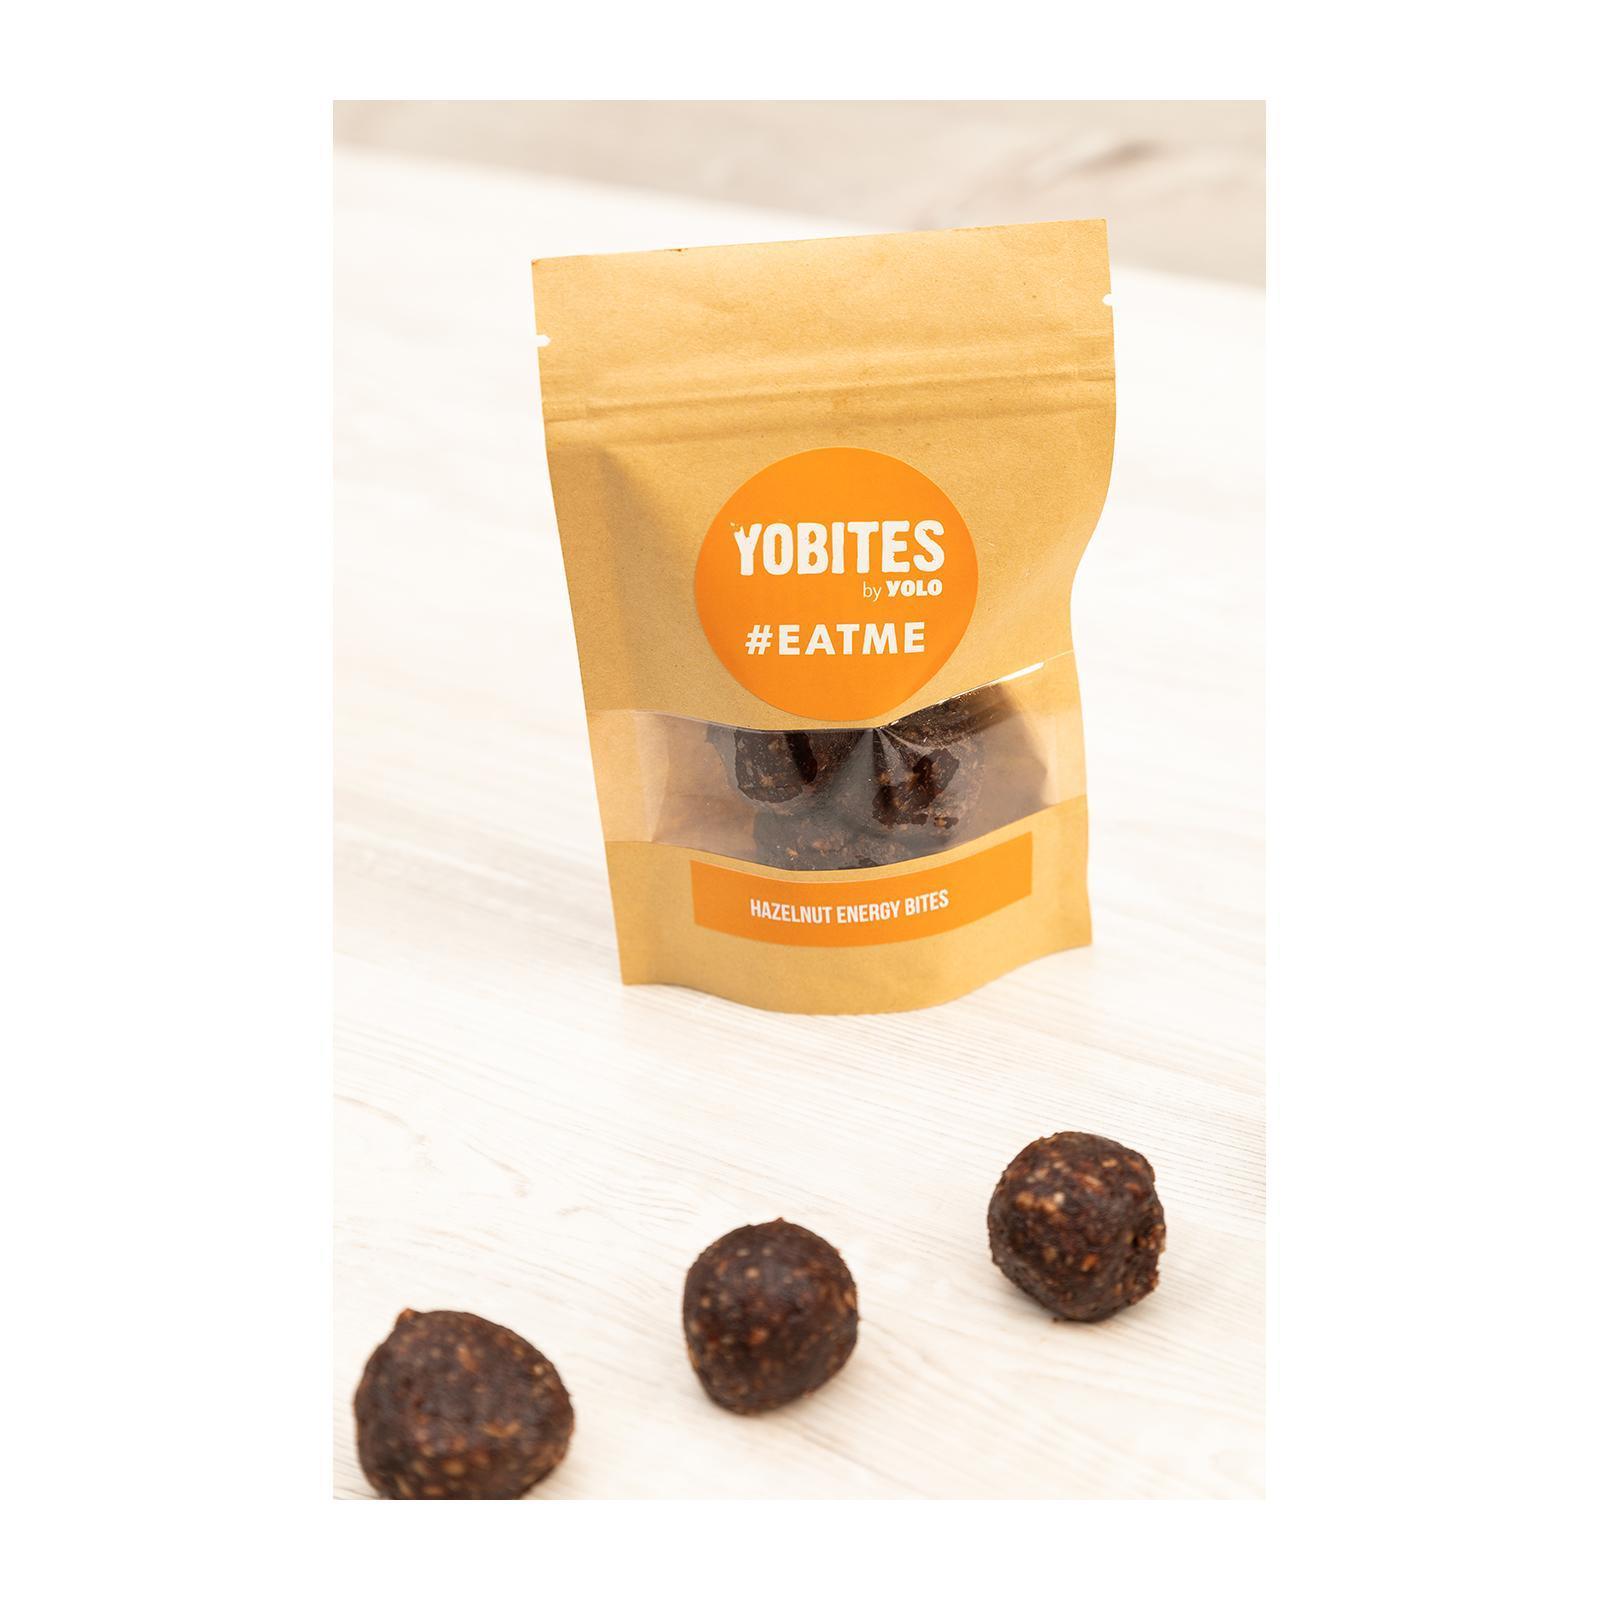 Yobites By Yolo Chocolate Hazelnut Energy Bites By Redmart.